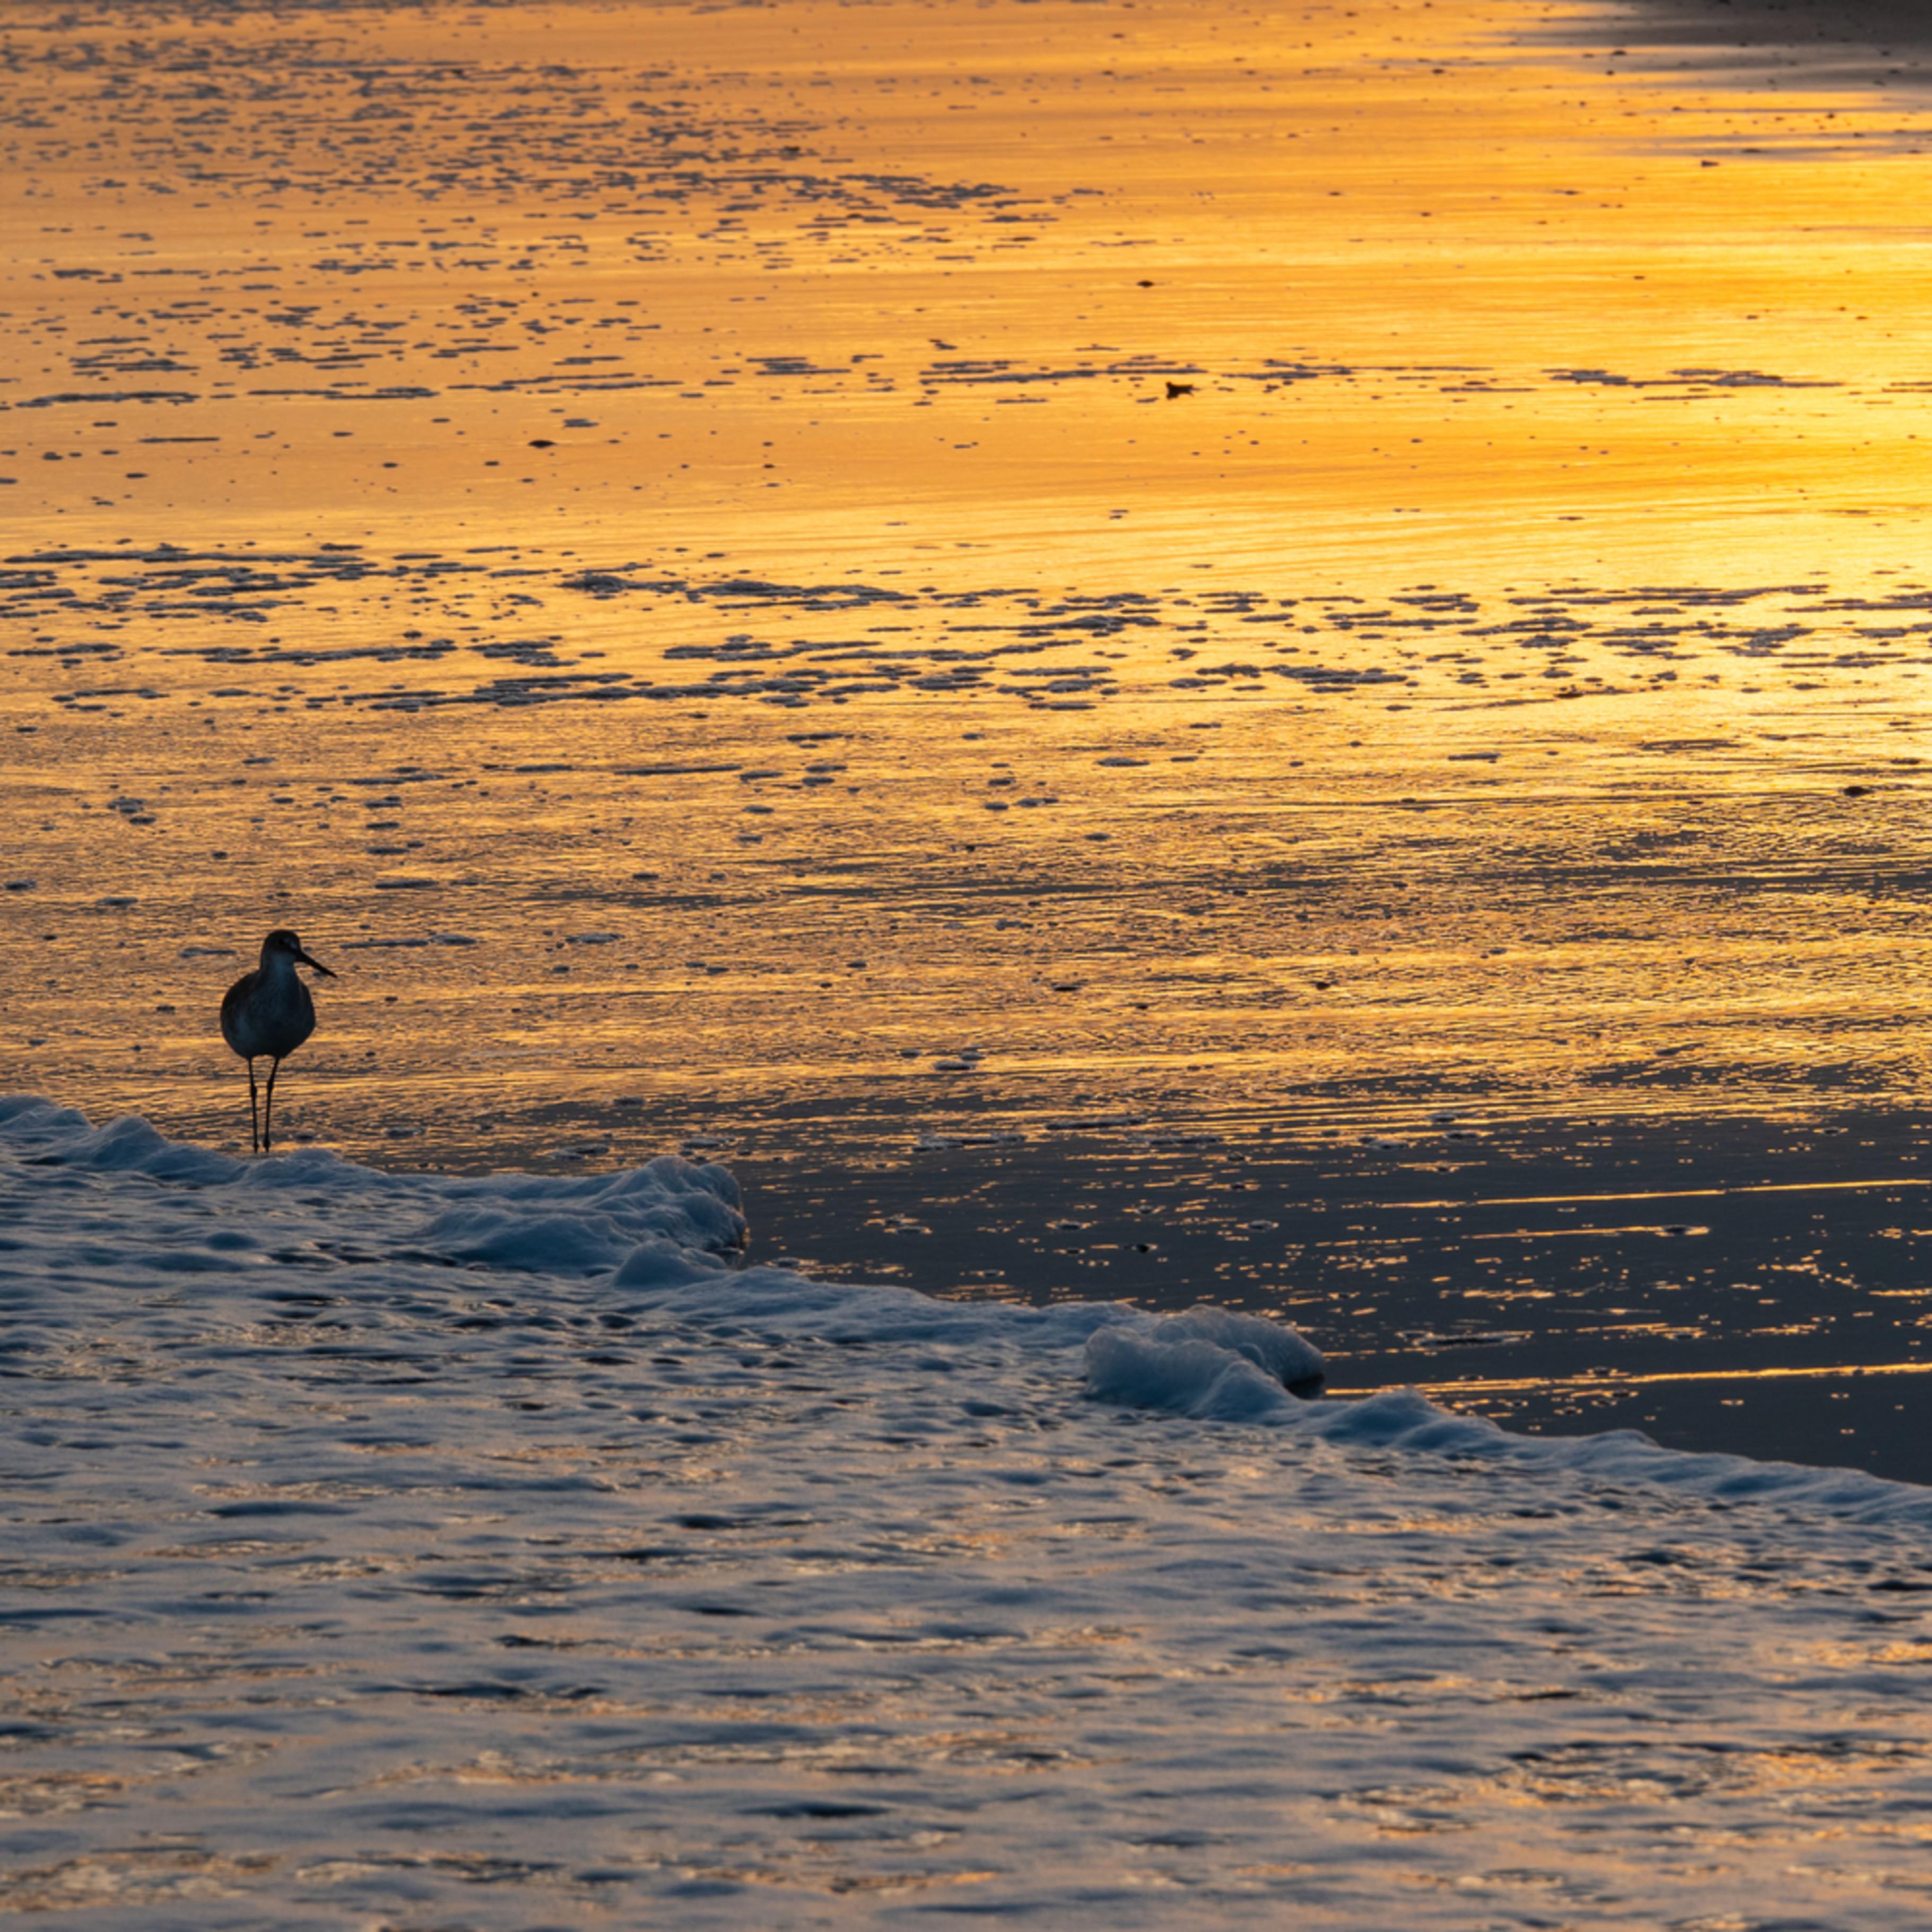 Sandpiper sunset dsc6713 l6nnoz